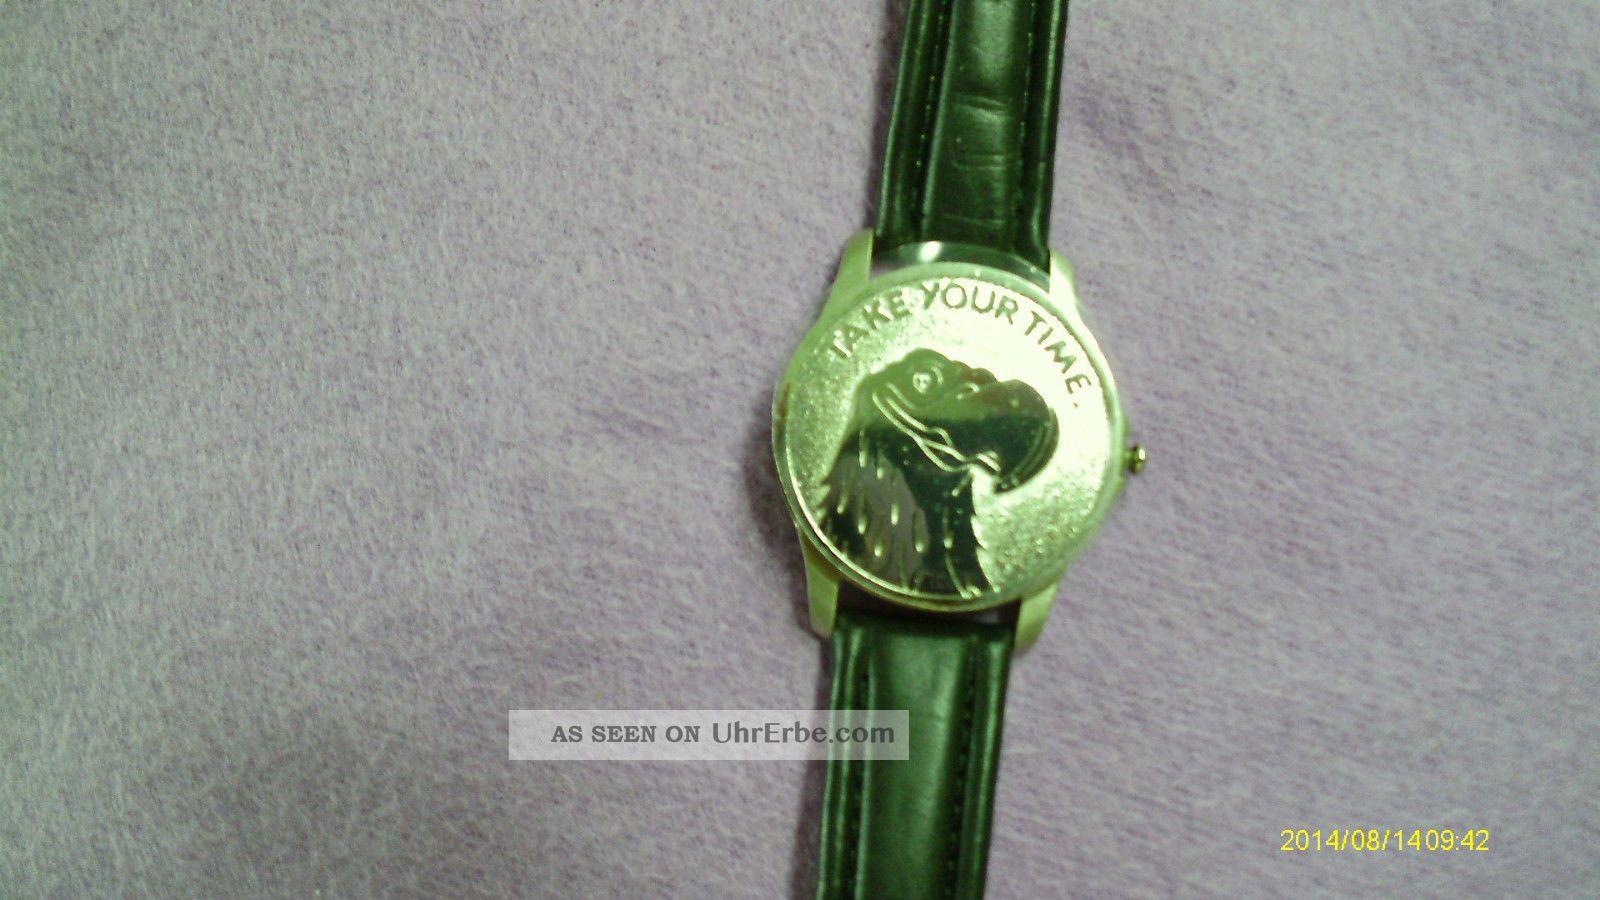 Herren Armbanduhr Mit Deckel Armband Schwarz Echt Leder Stainless Steel Case Bac Armbanduhren Bild